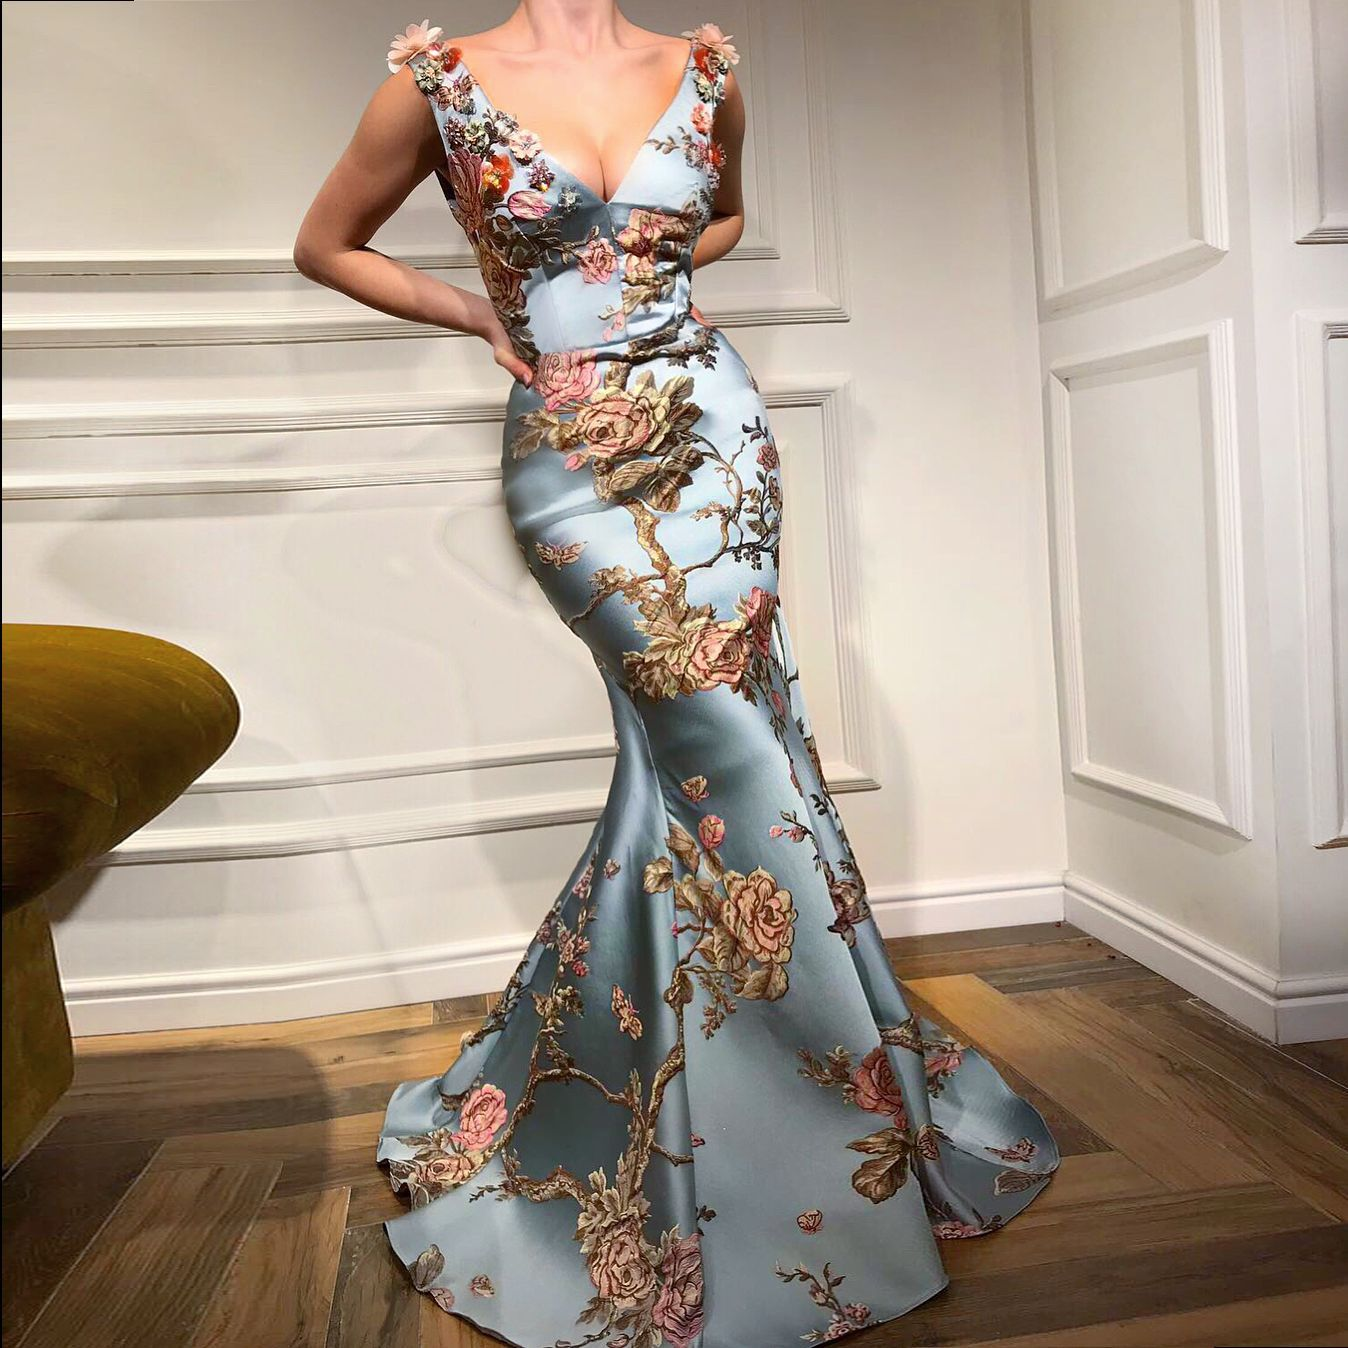 Elegant Floral Print Woman Trumpet Dress 2019 Spring Summer Sexy V Neck Party Dress to the Floor Vintage Club Vestido